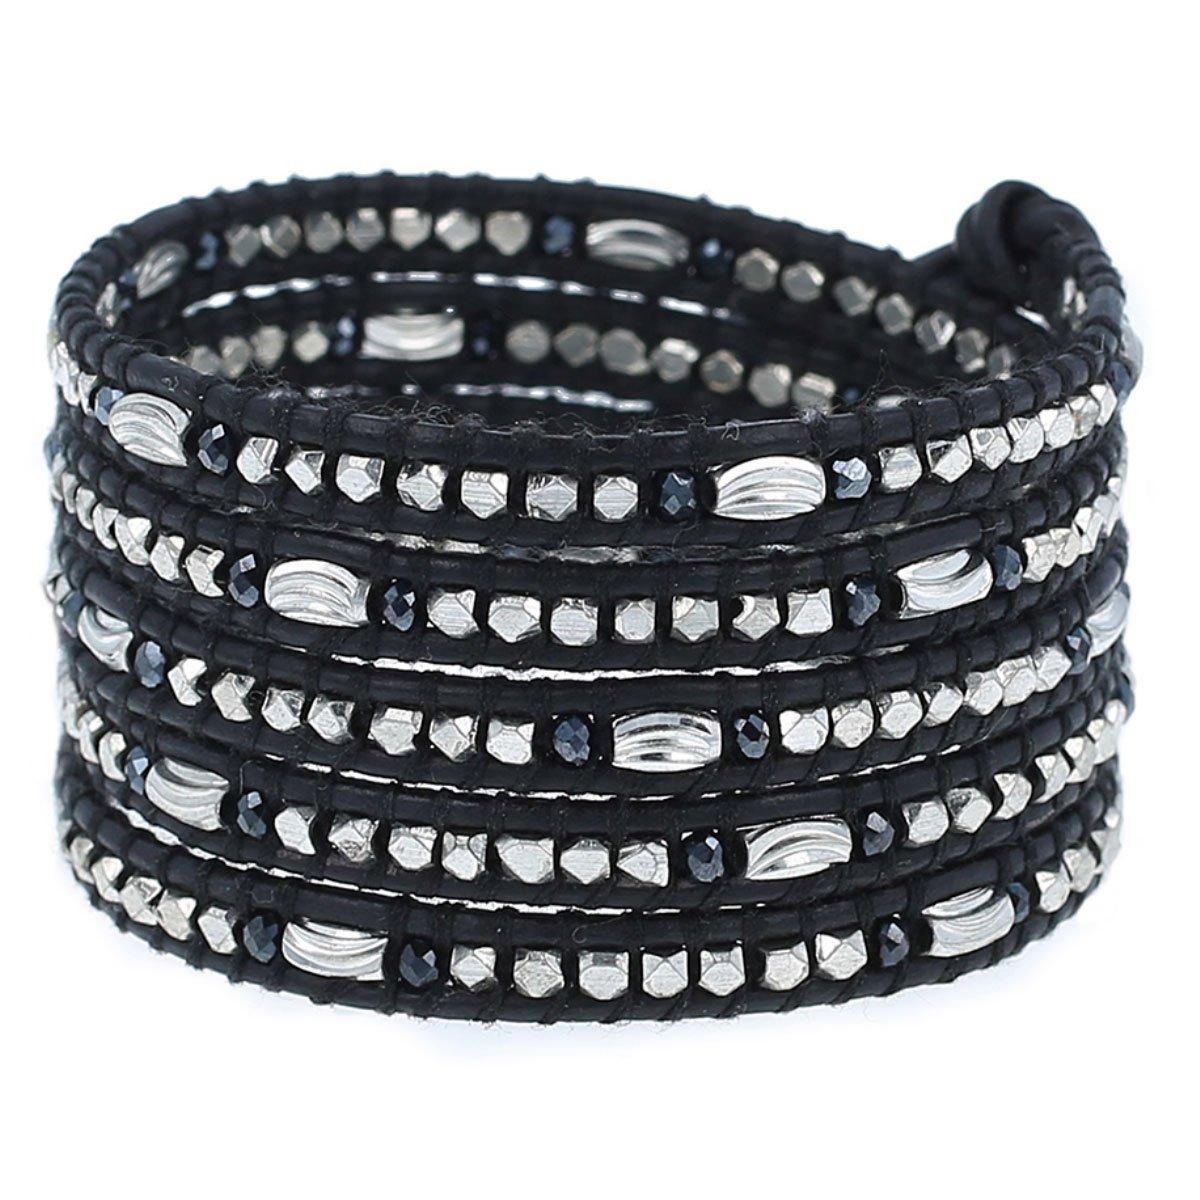 Chan Luu Midnight Mix Bead Wrap Bracelet on Natural Black Leather